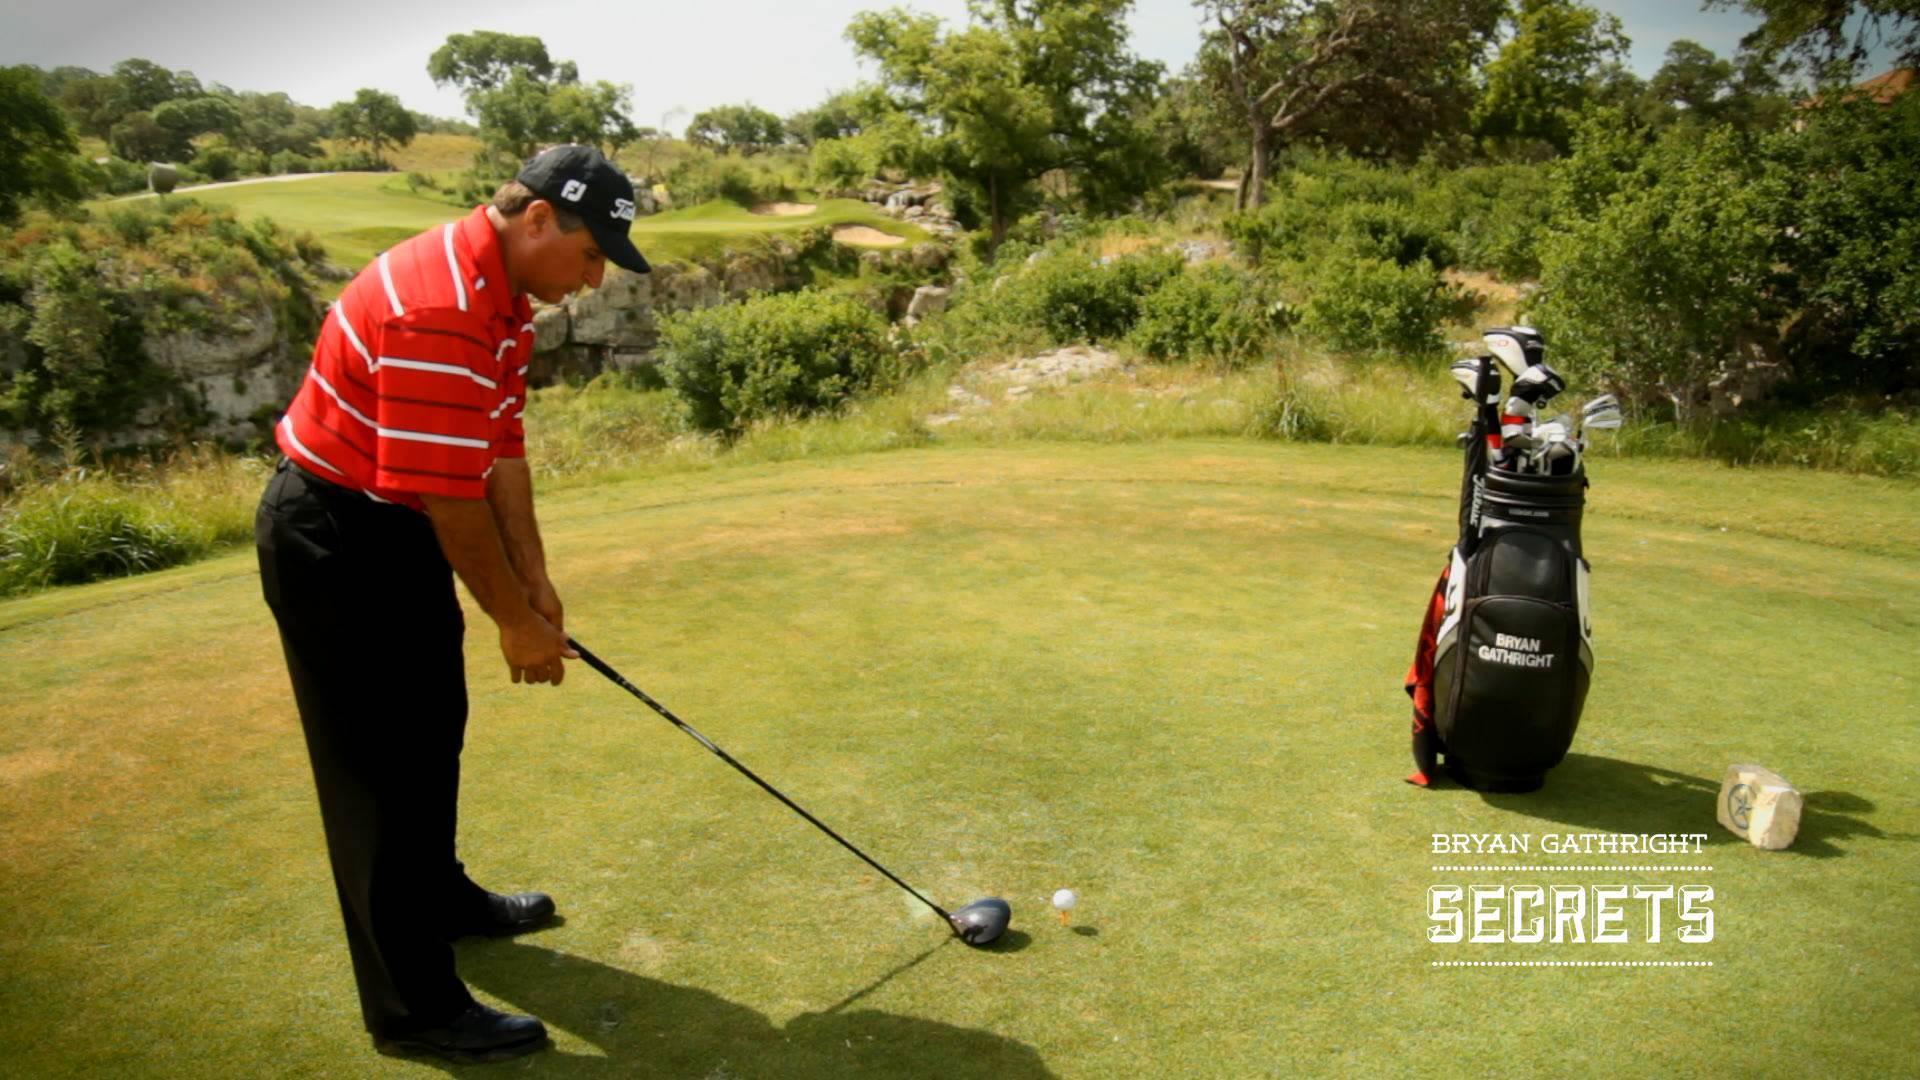 Keep Your Head Down is Major Golf Swing Error - Secret #7